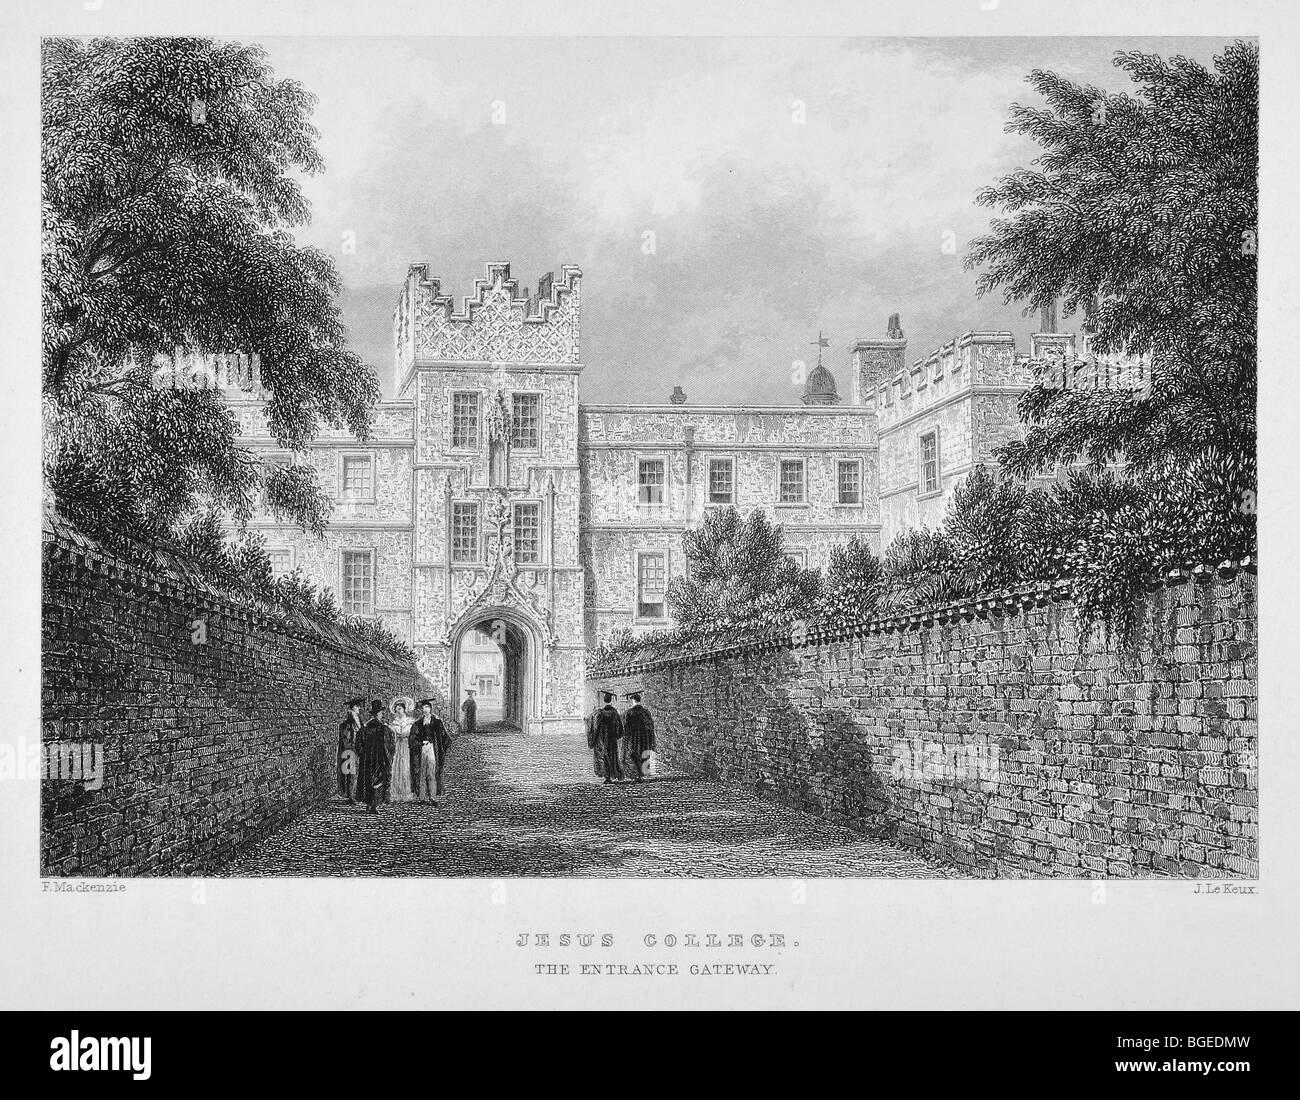 Jesus College, Cambridge, the entrance gateway - Stock Image